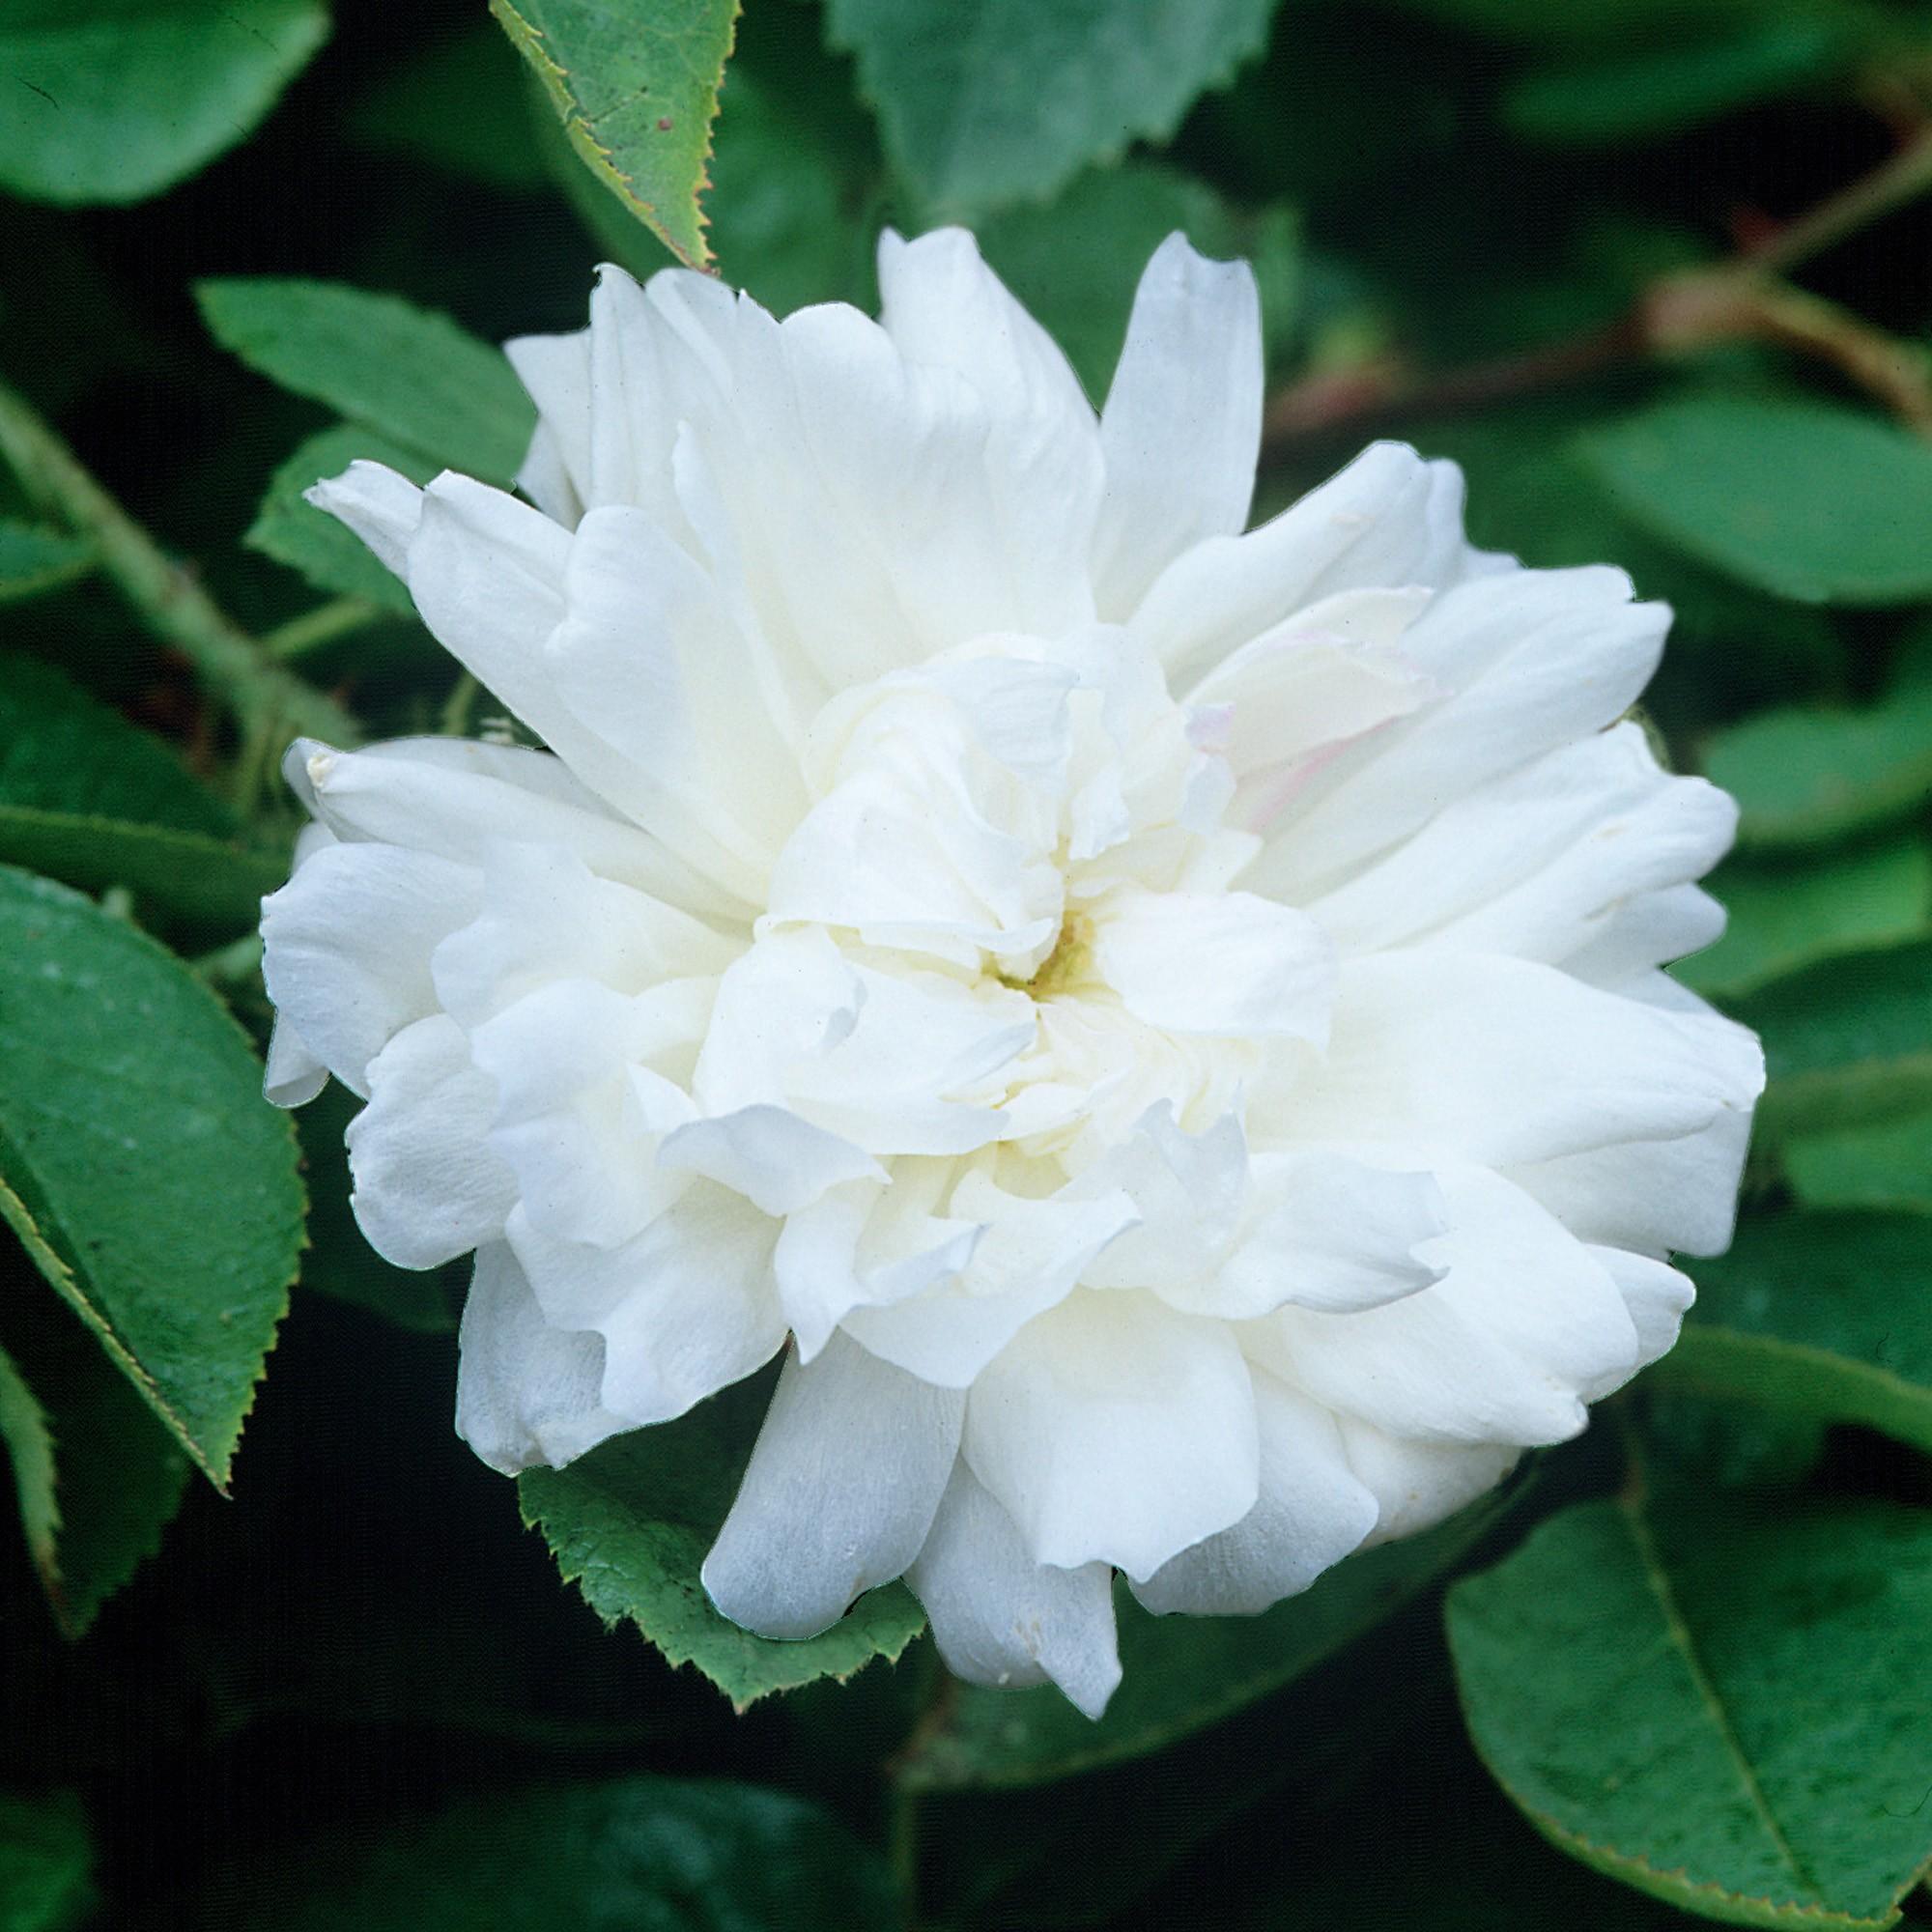 World beautiful flowers image